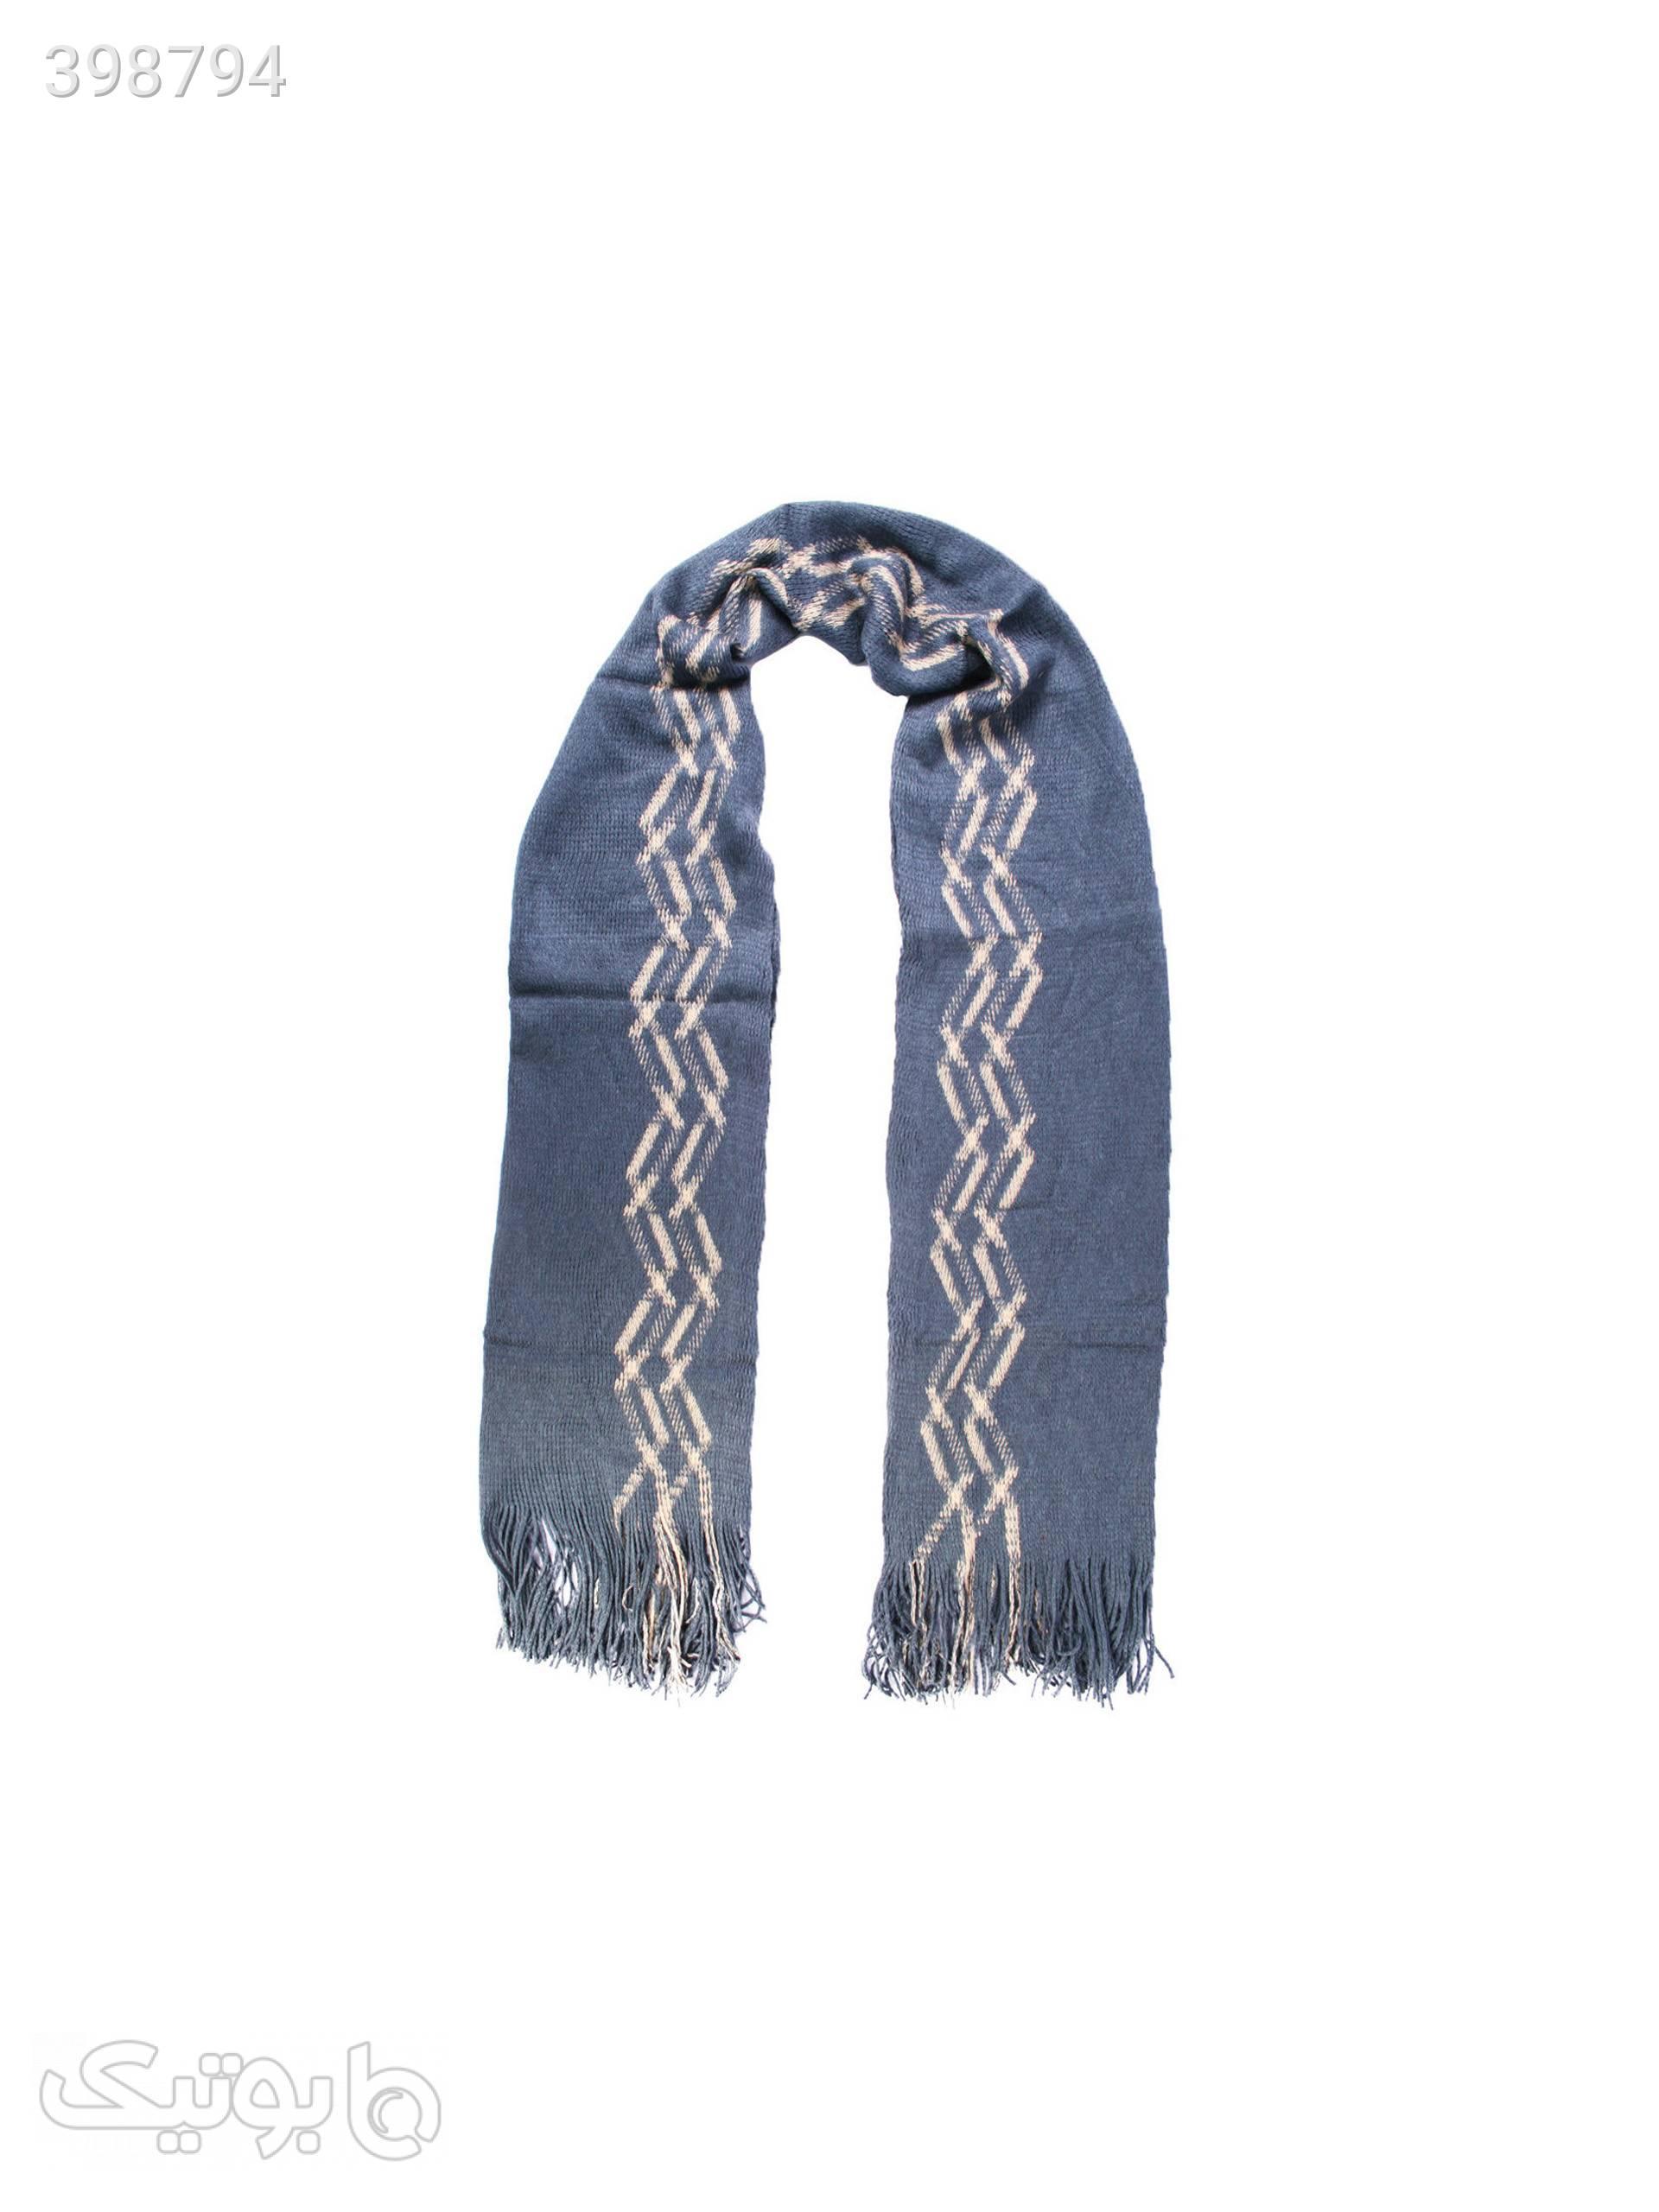 شال بافت زنانه LNZ-SCRF-01 آبی شال و روسری